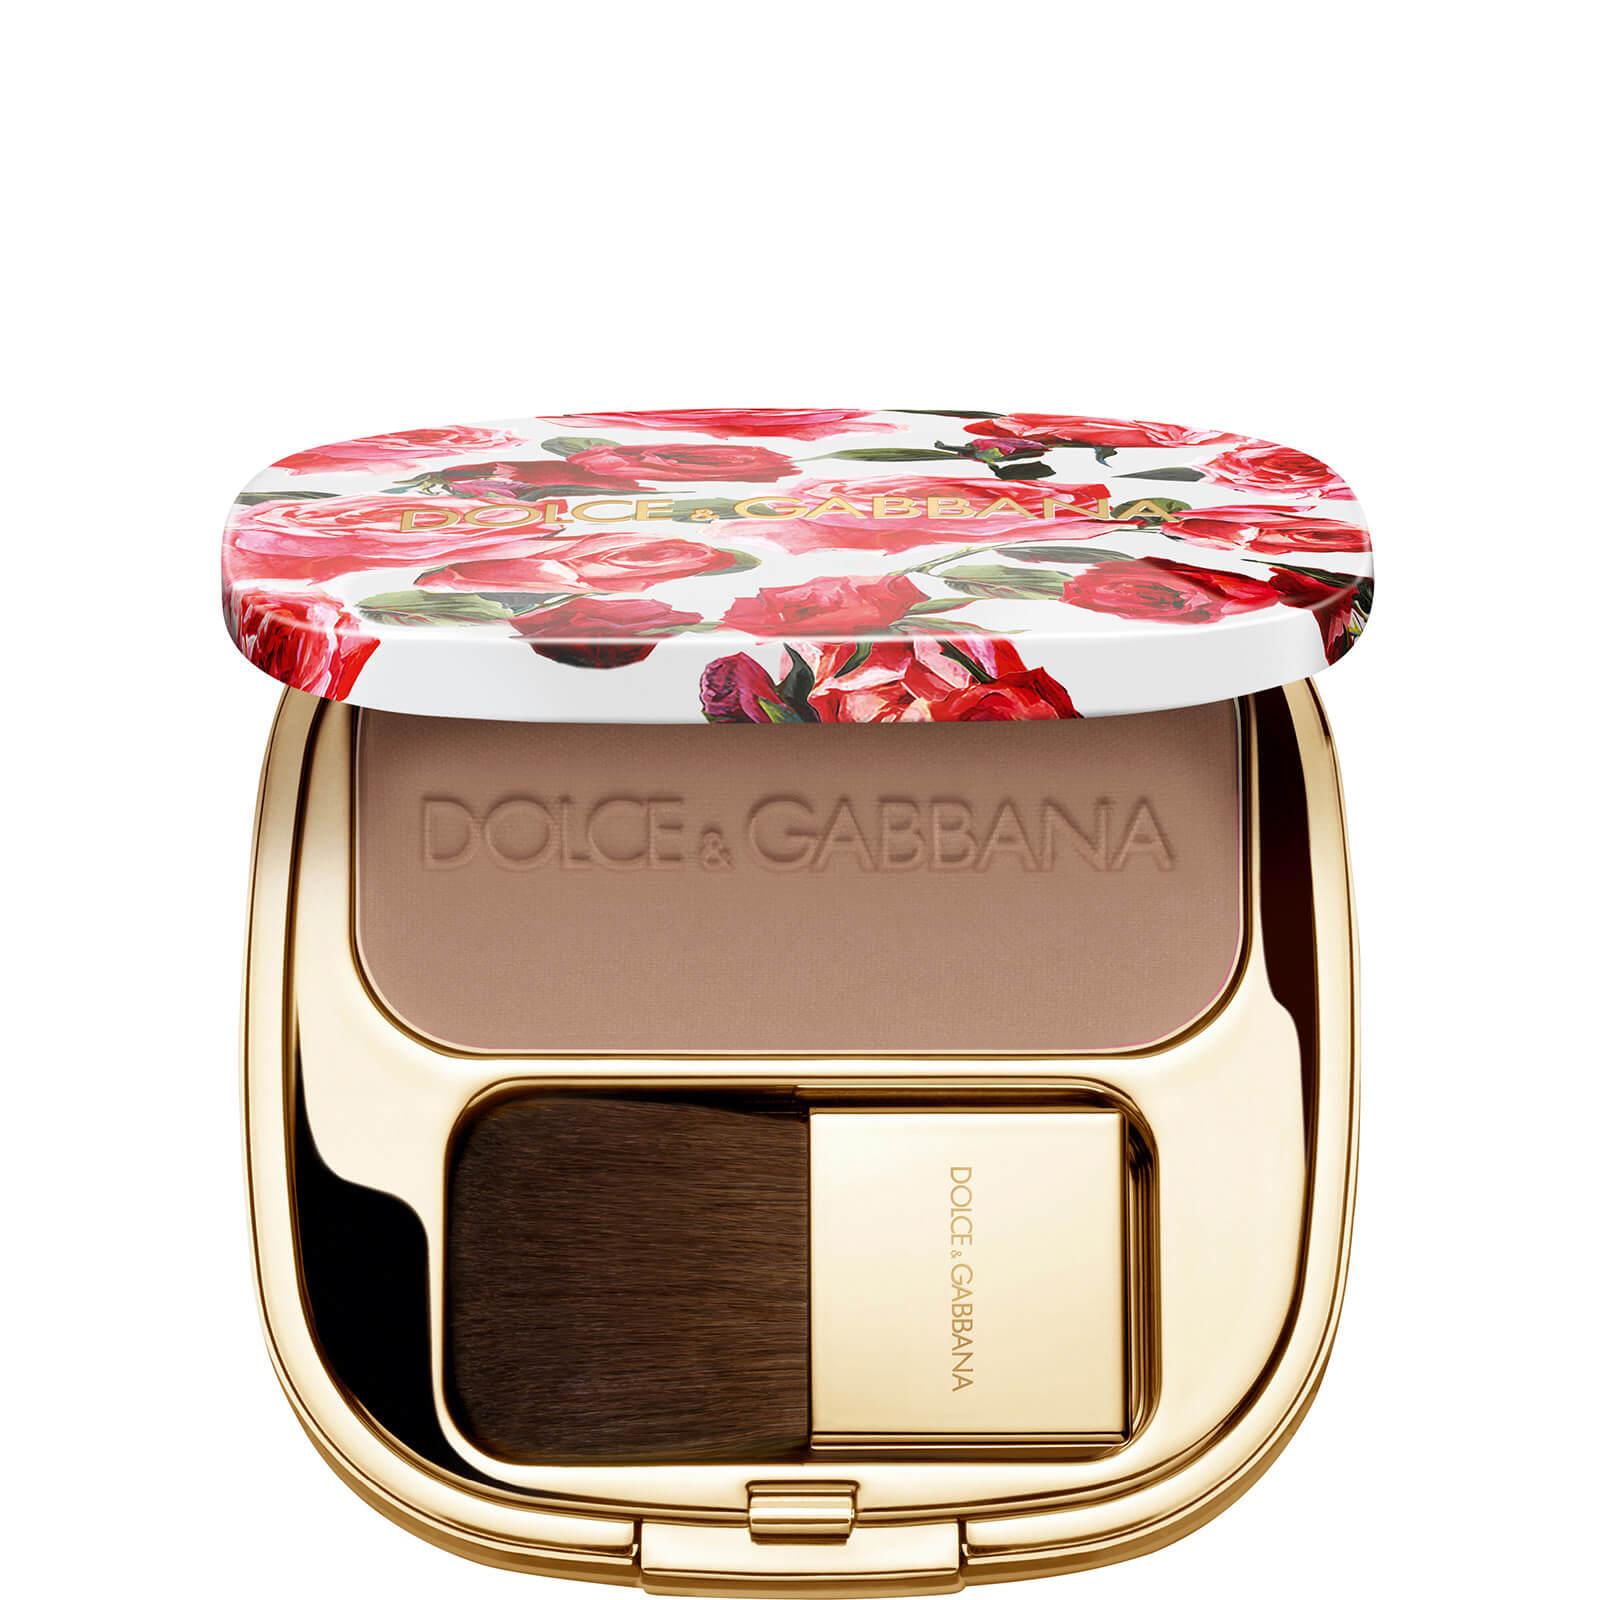 Купить Dolce&Gabbana Blush of Roses Luminous Cheek Colour 5g (Various Shades) - 100 Tan